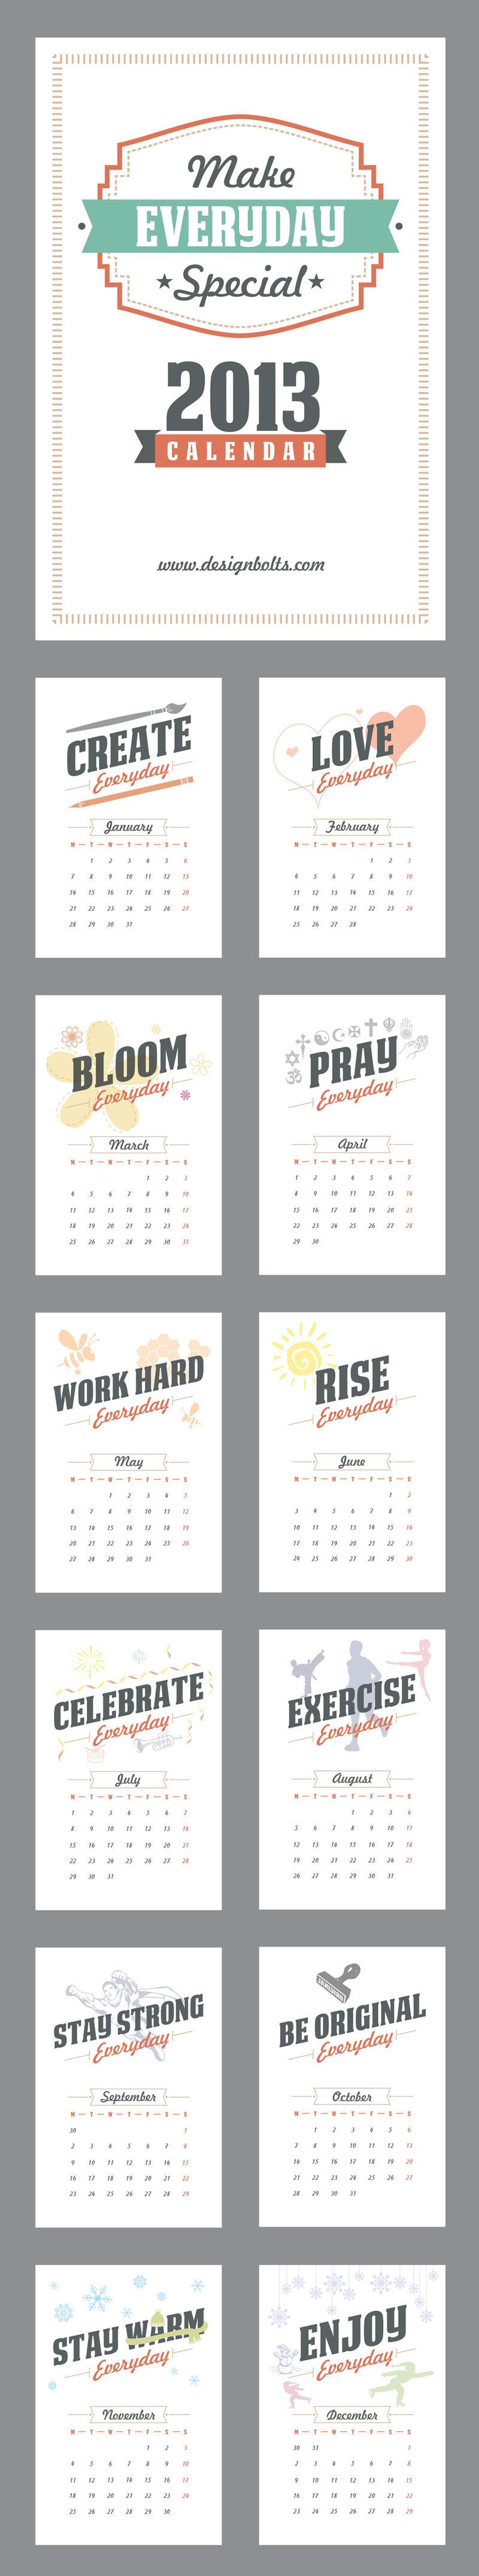 Make Everyday Special Calendar 2013 Printable by Designbolts